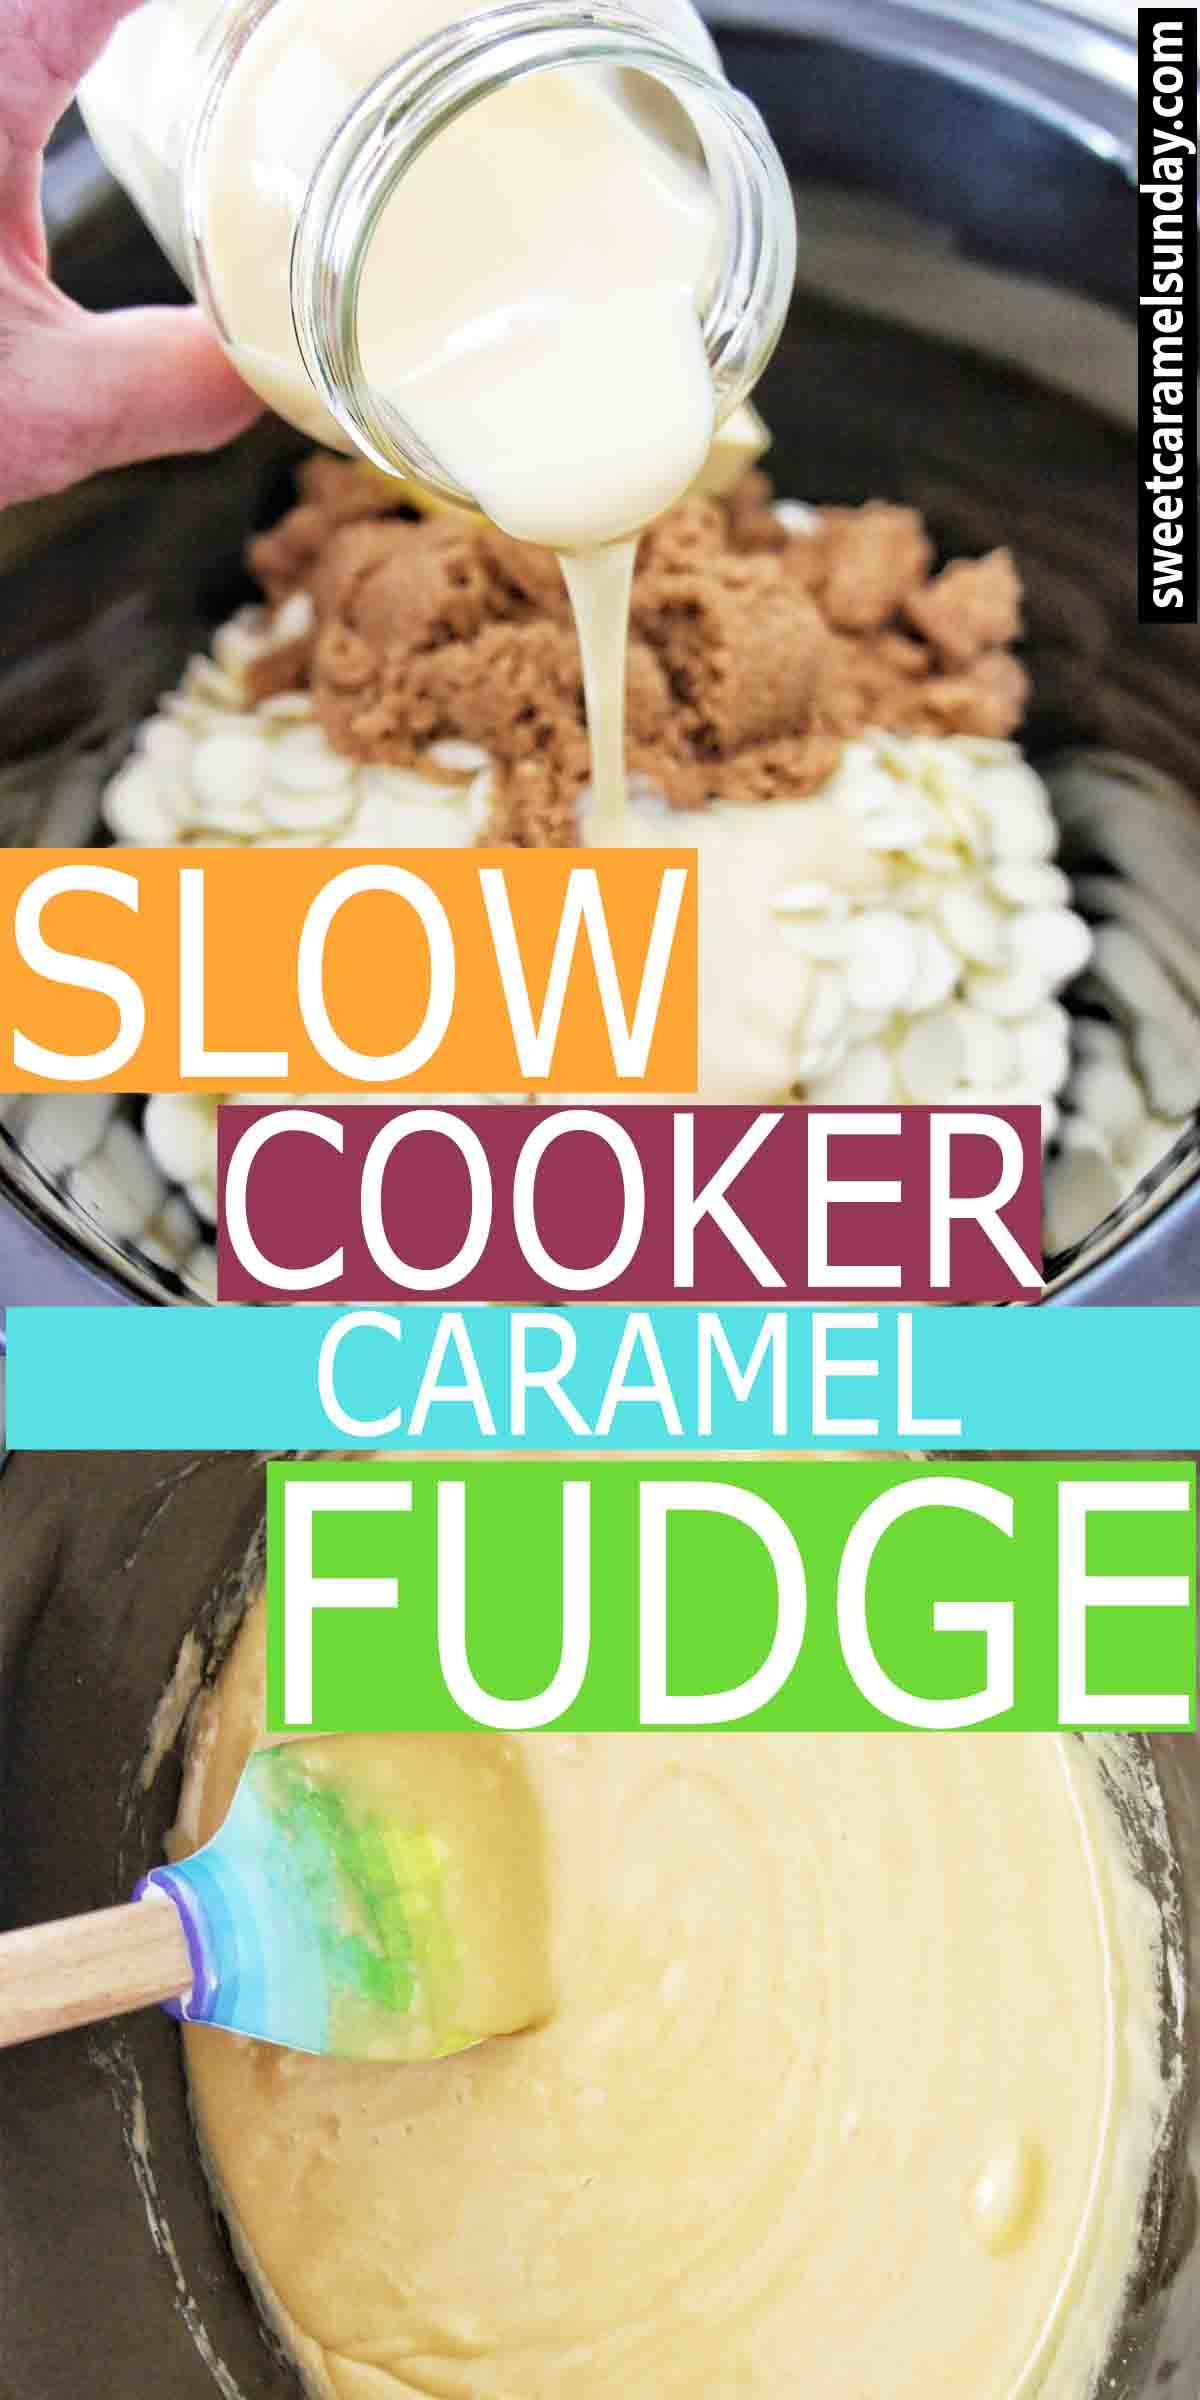 Slow Cooker Caramel Fudge In 2020 Slow Cooker Fudge Fudge Recipes Caramel Fudge